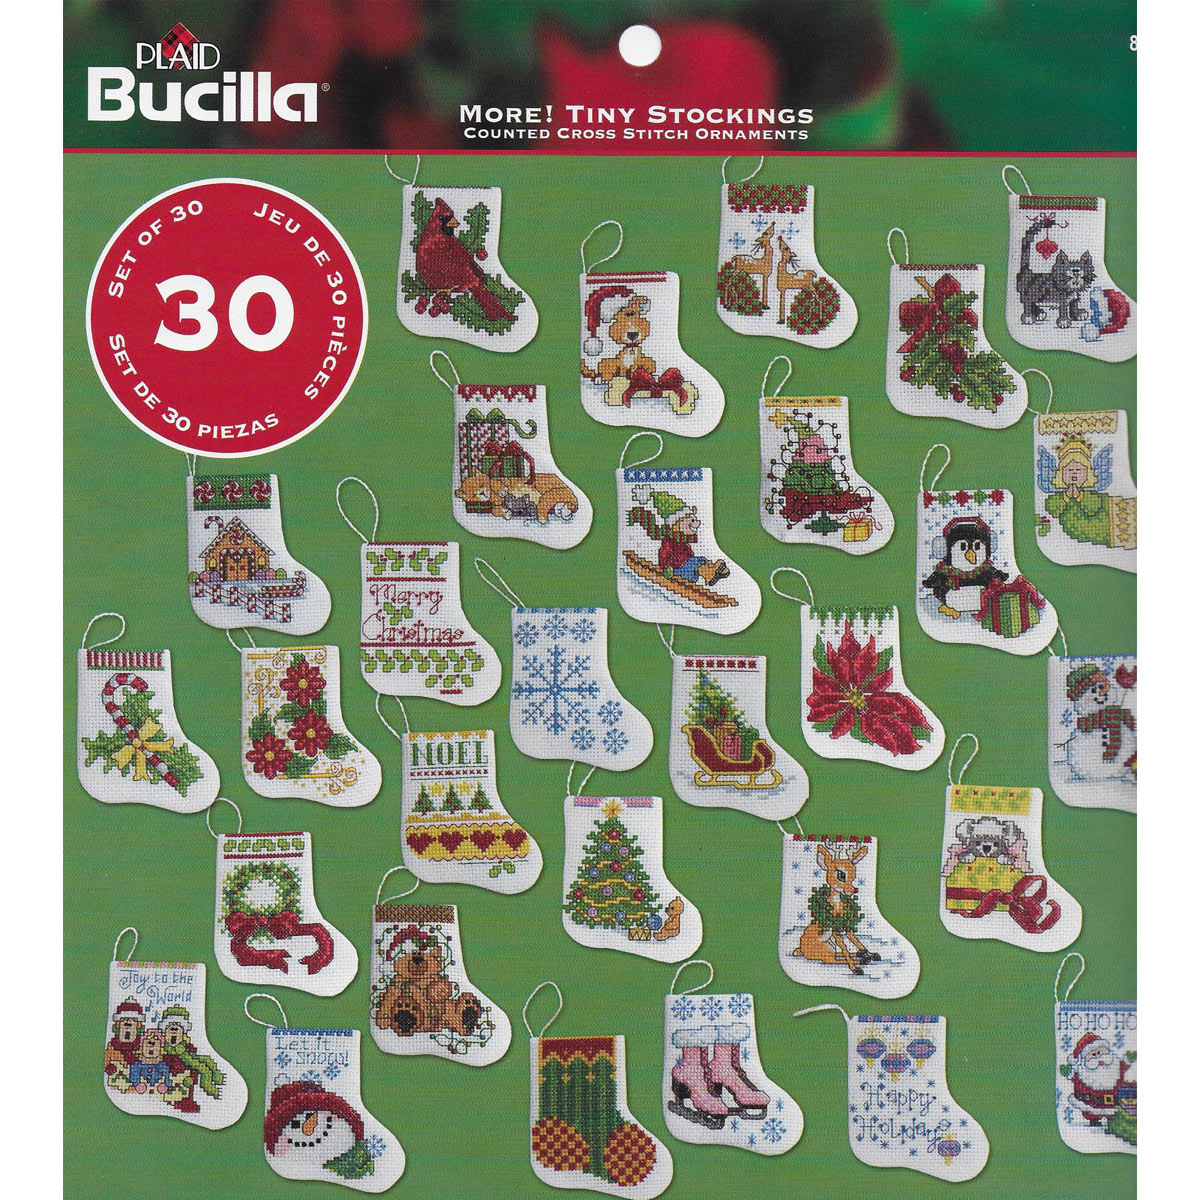 Bucilla ® Seasonal - Counted Cross Stitch - Ornament Kits - More Tiny Stockings